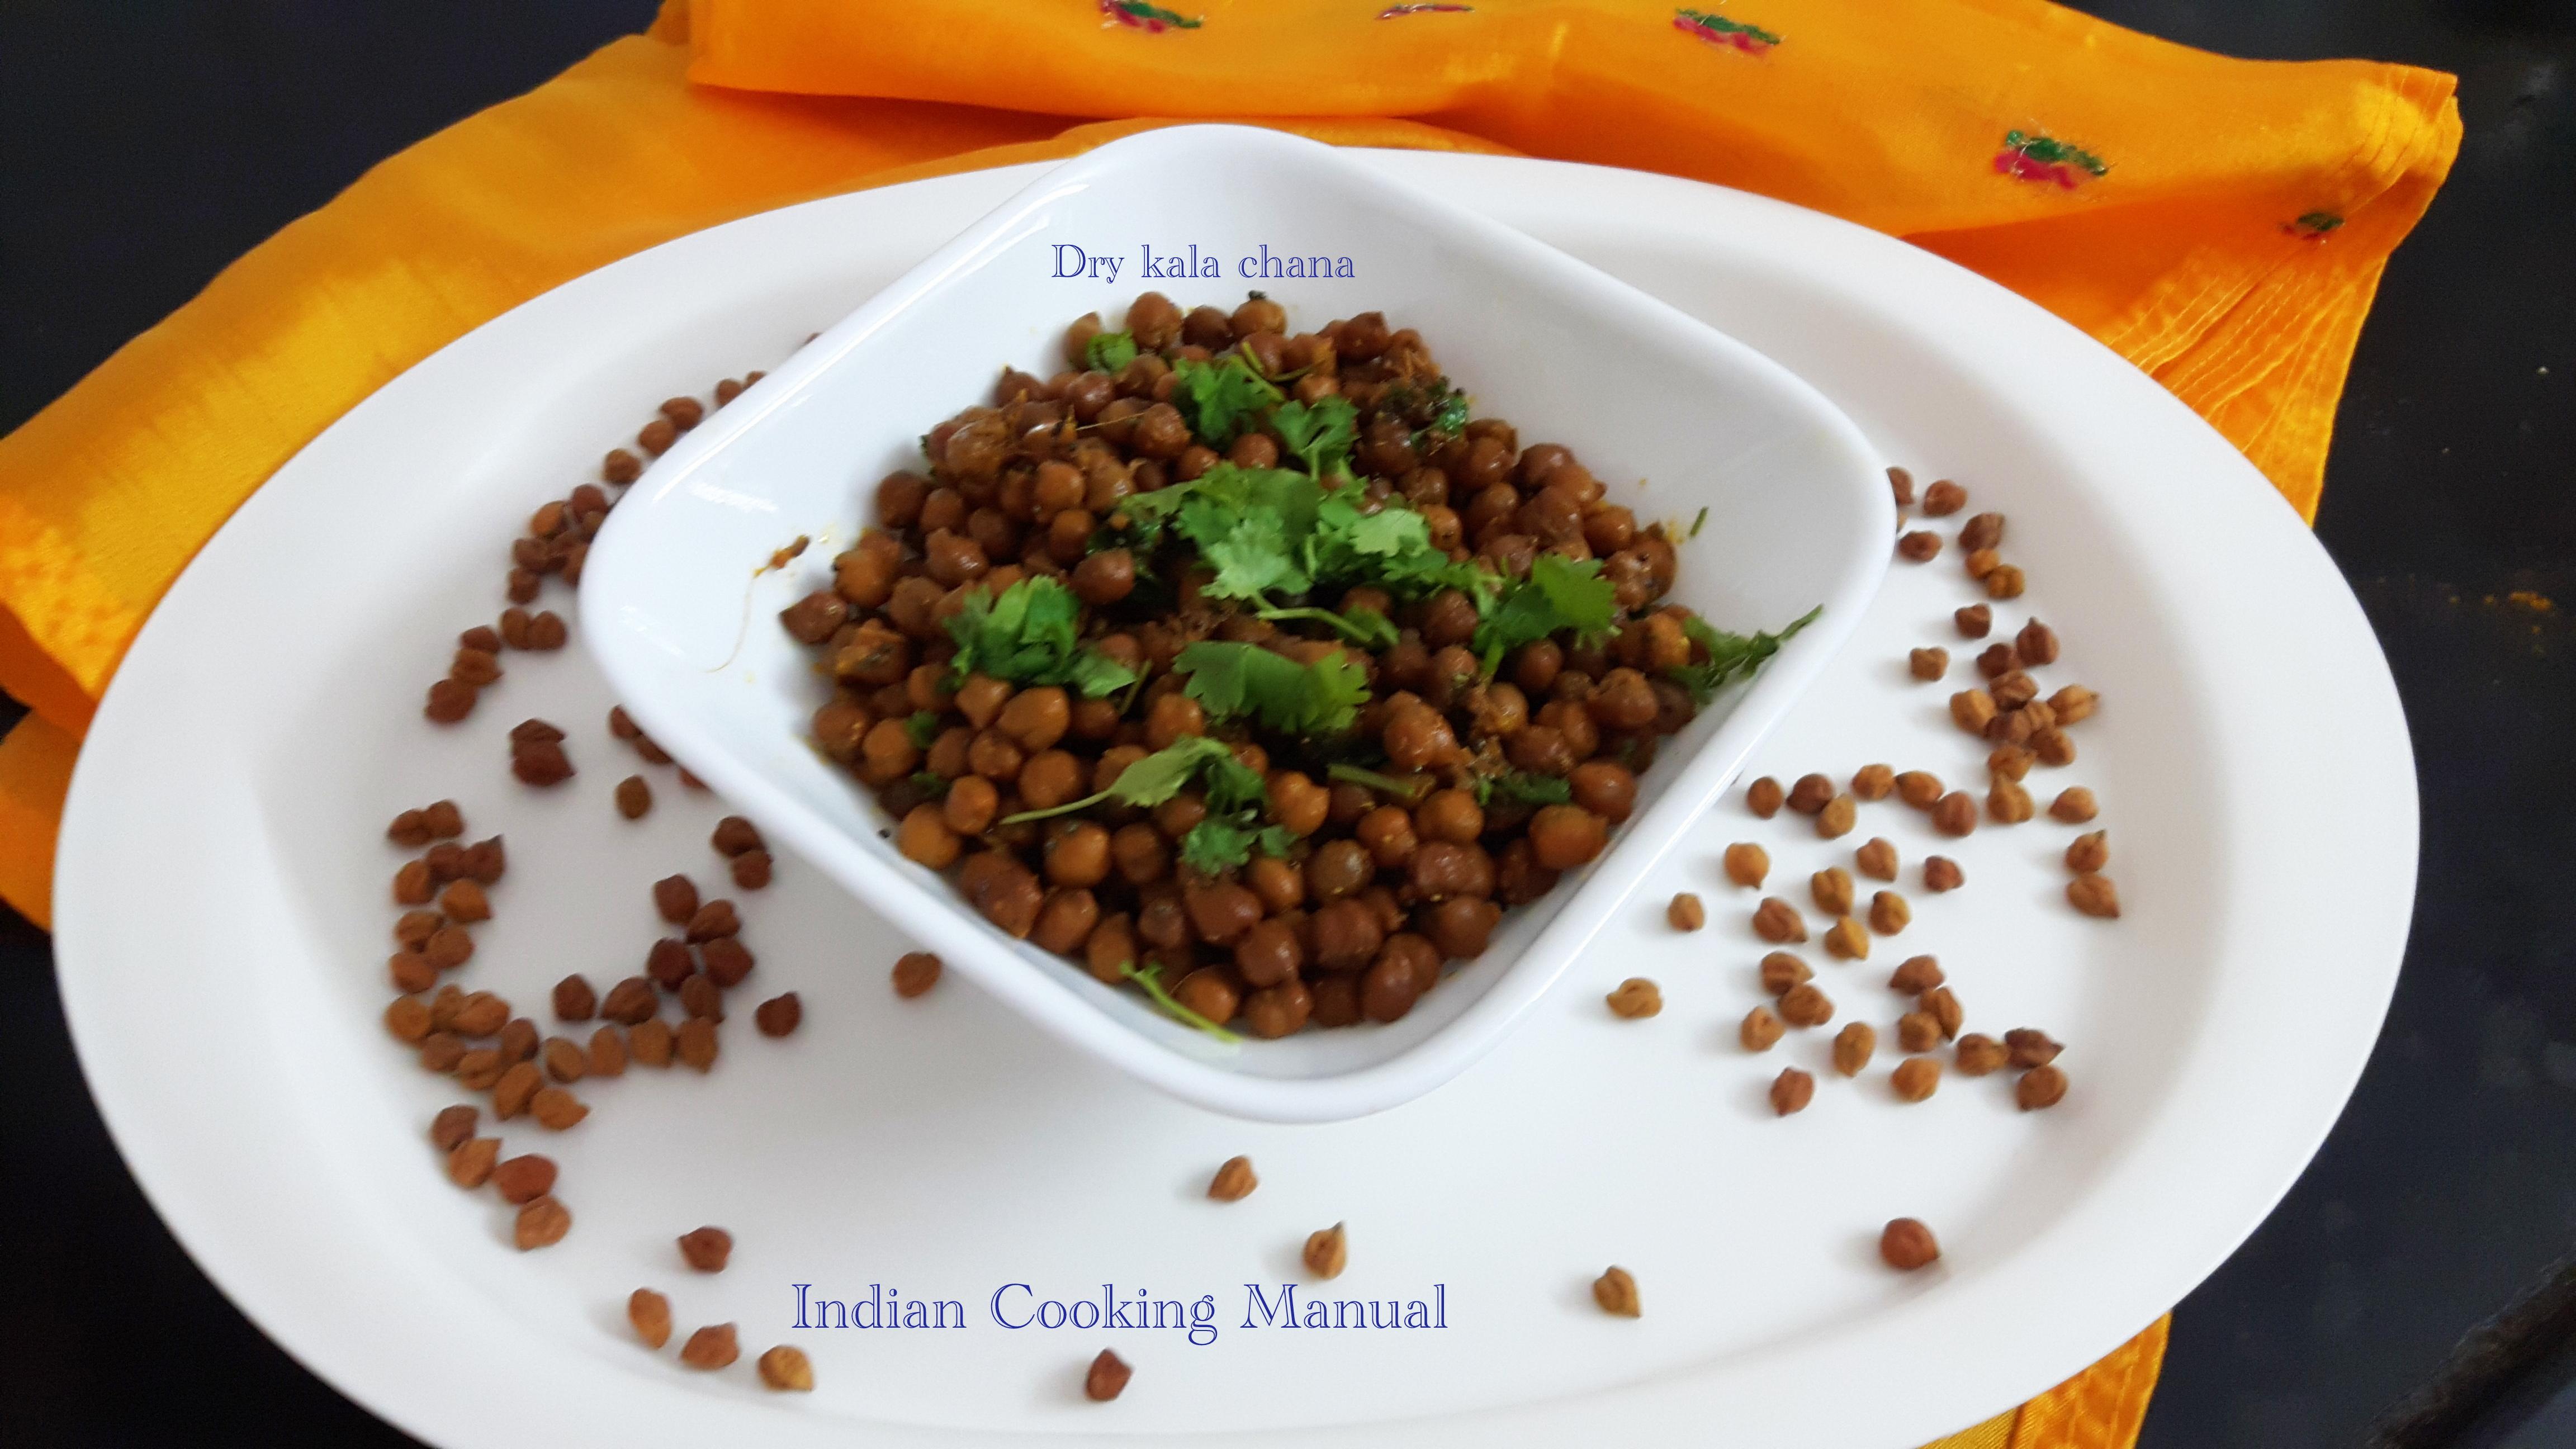 Dry kala chana (Bengal gram)